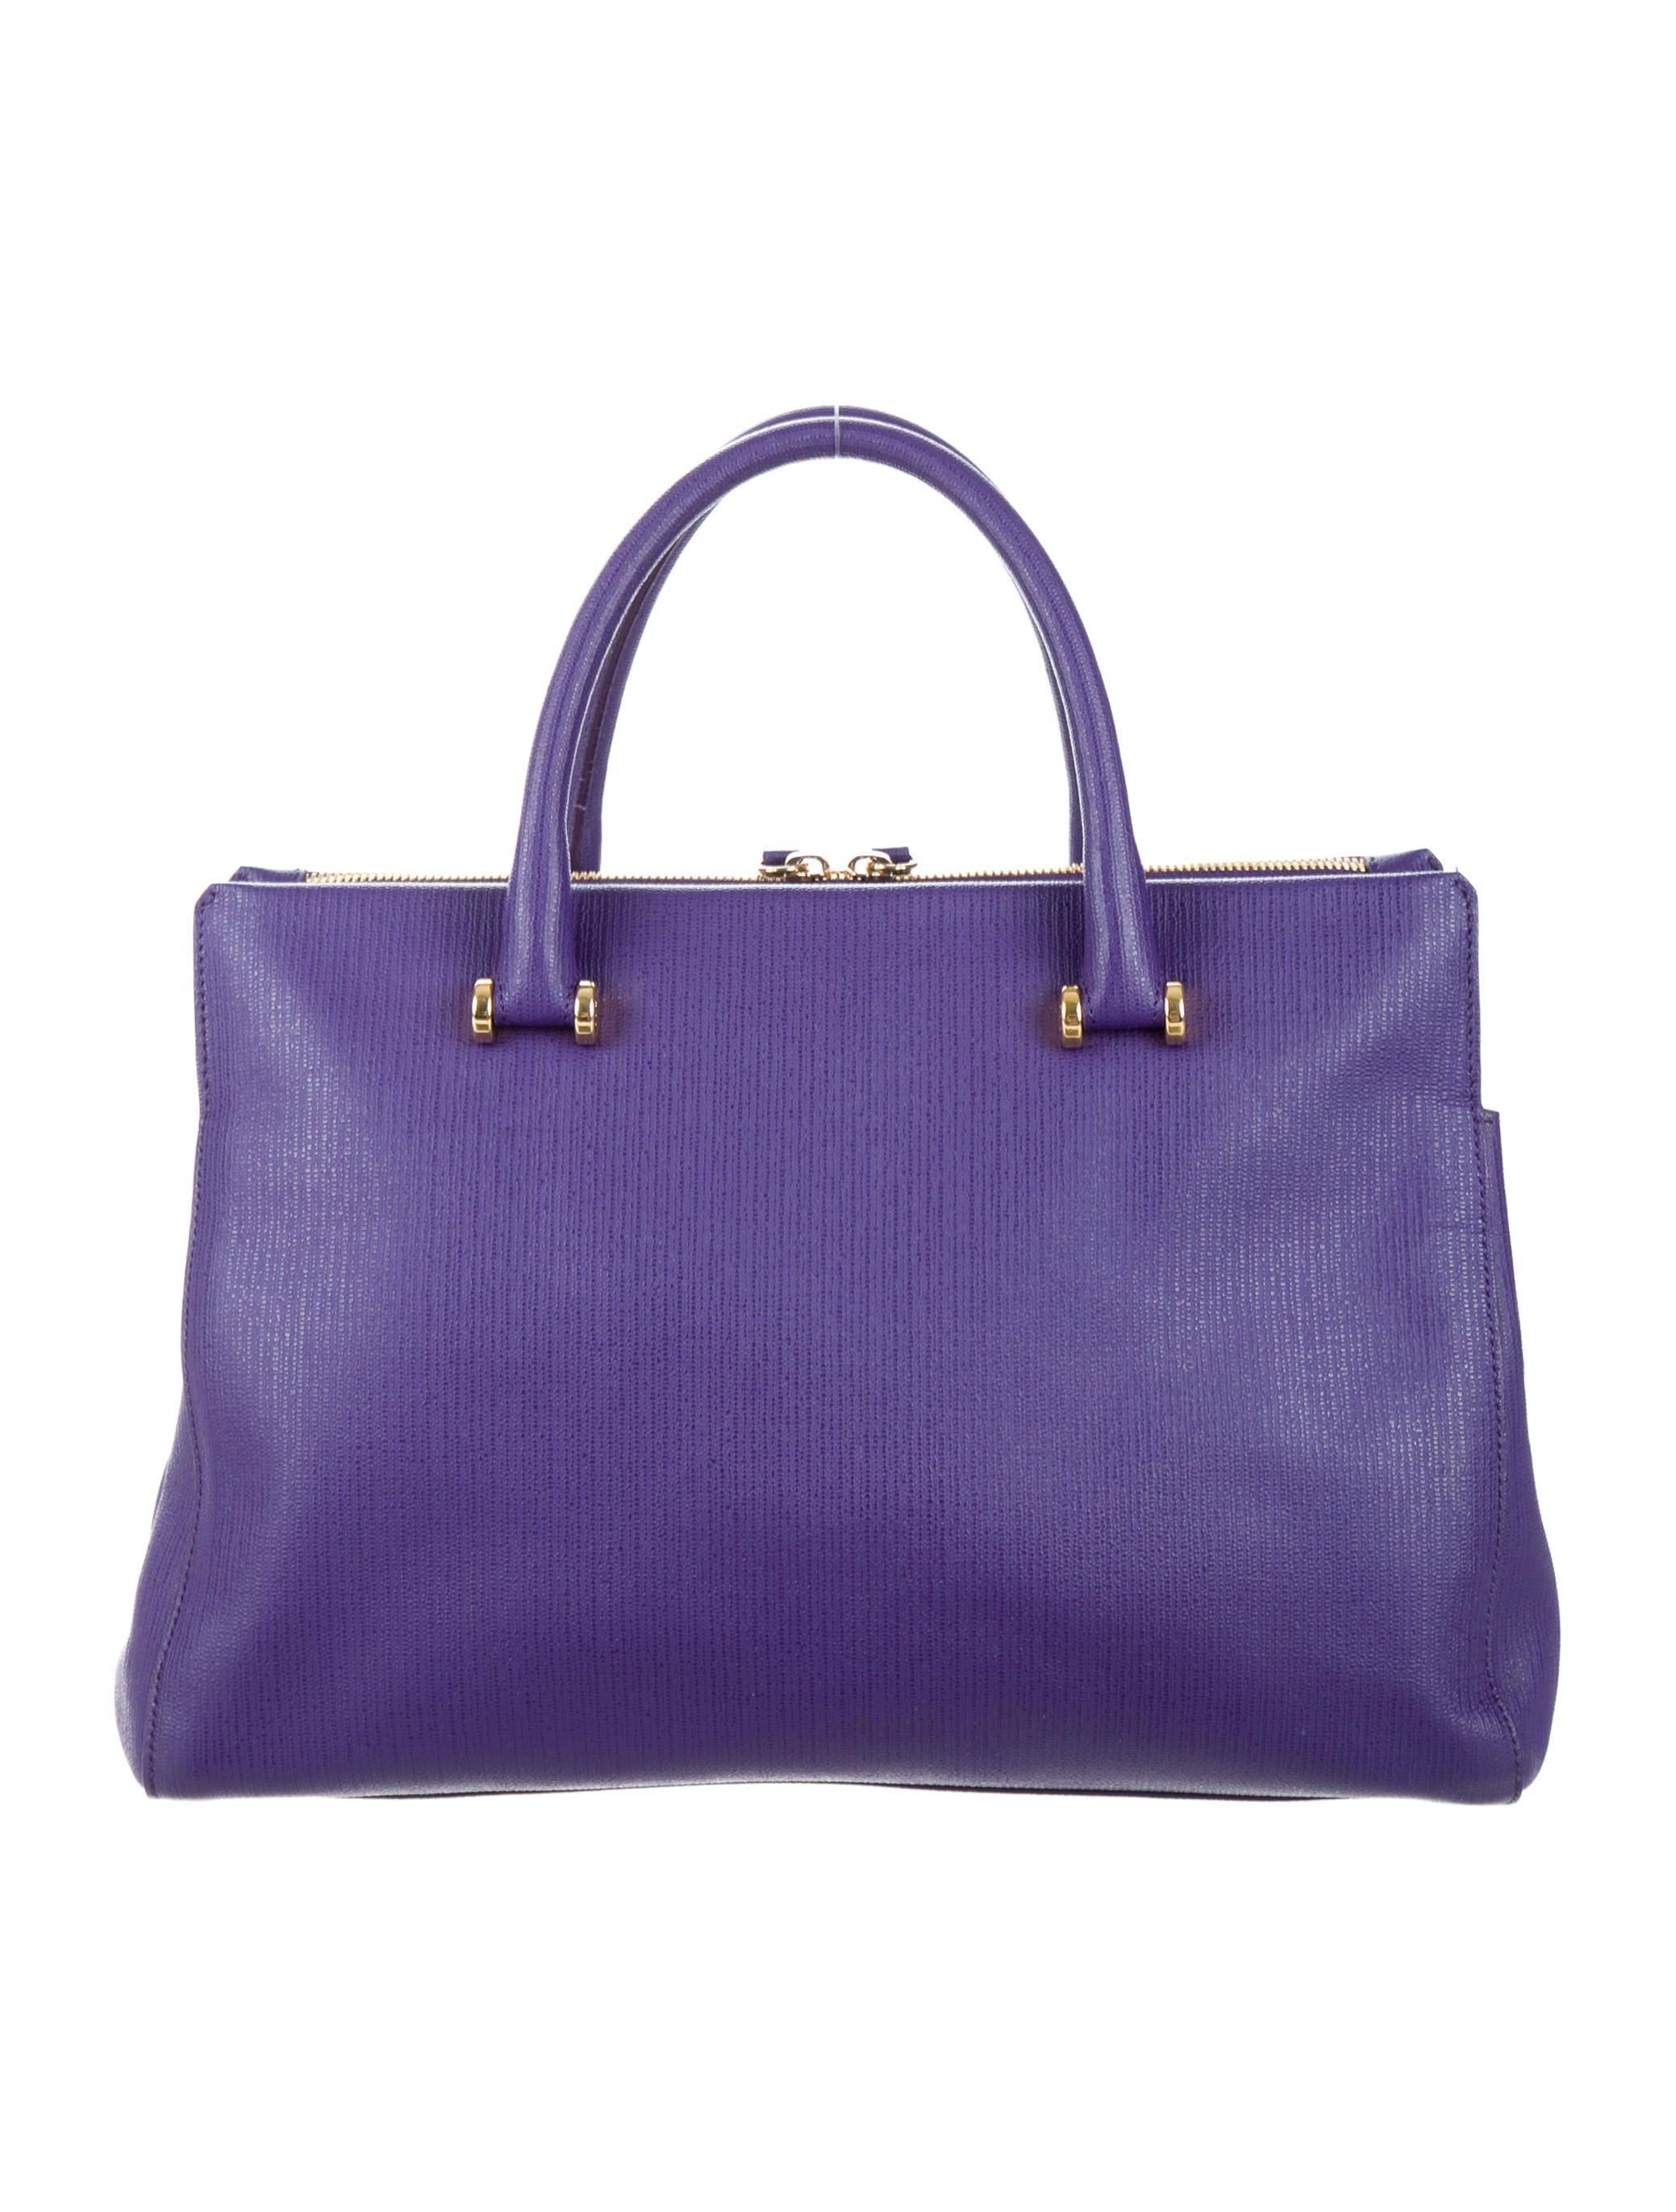 Furla Leather Dome Satchel - Handbags - WFU20261 : The RealReal